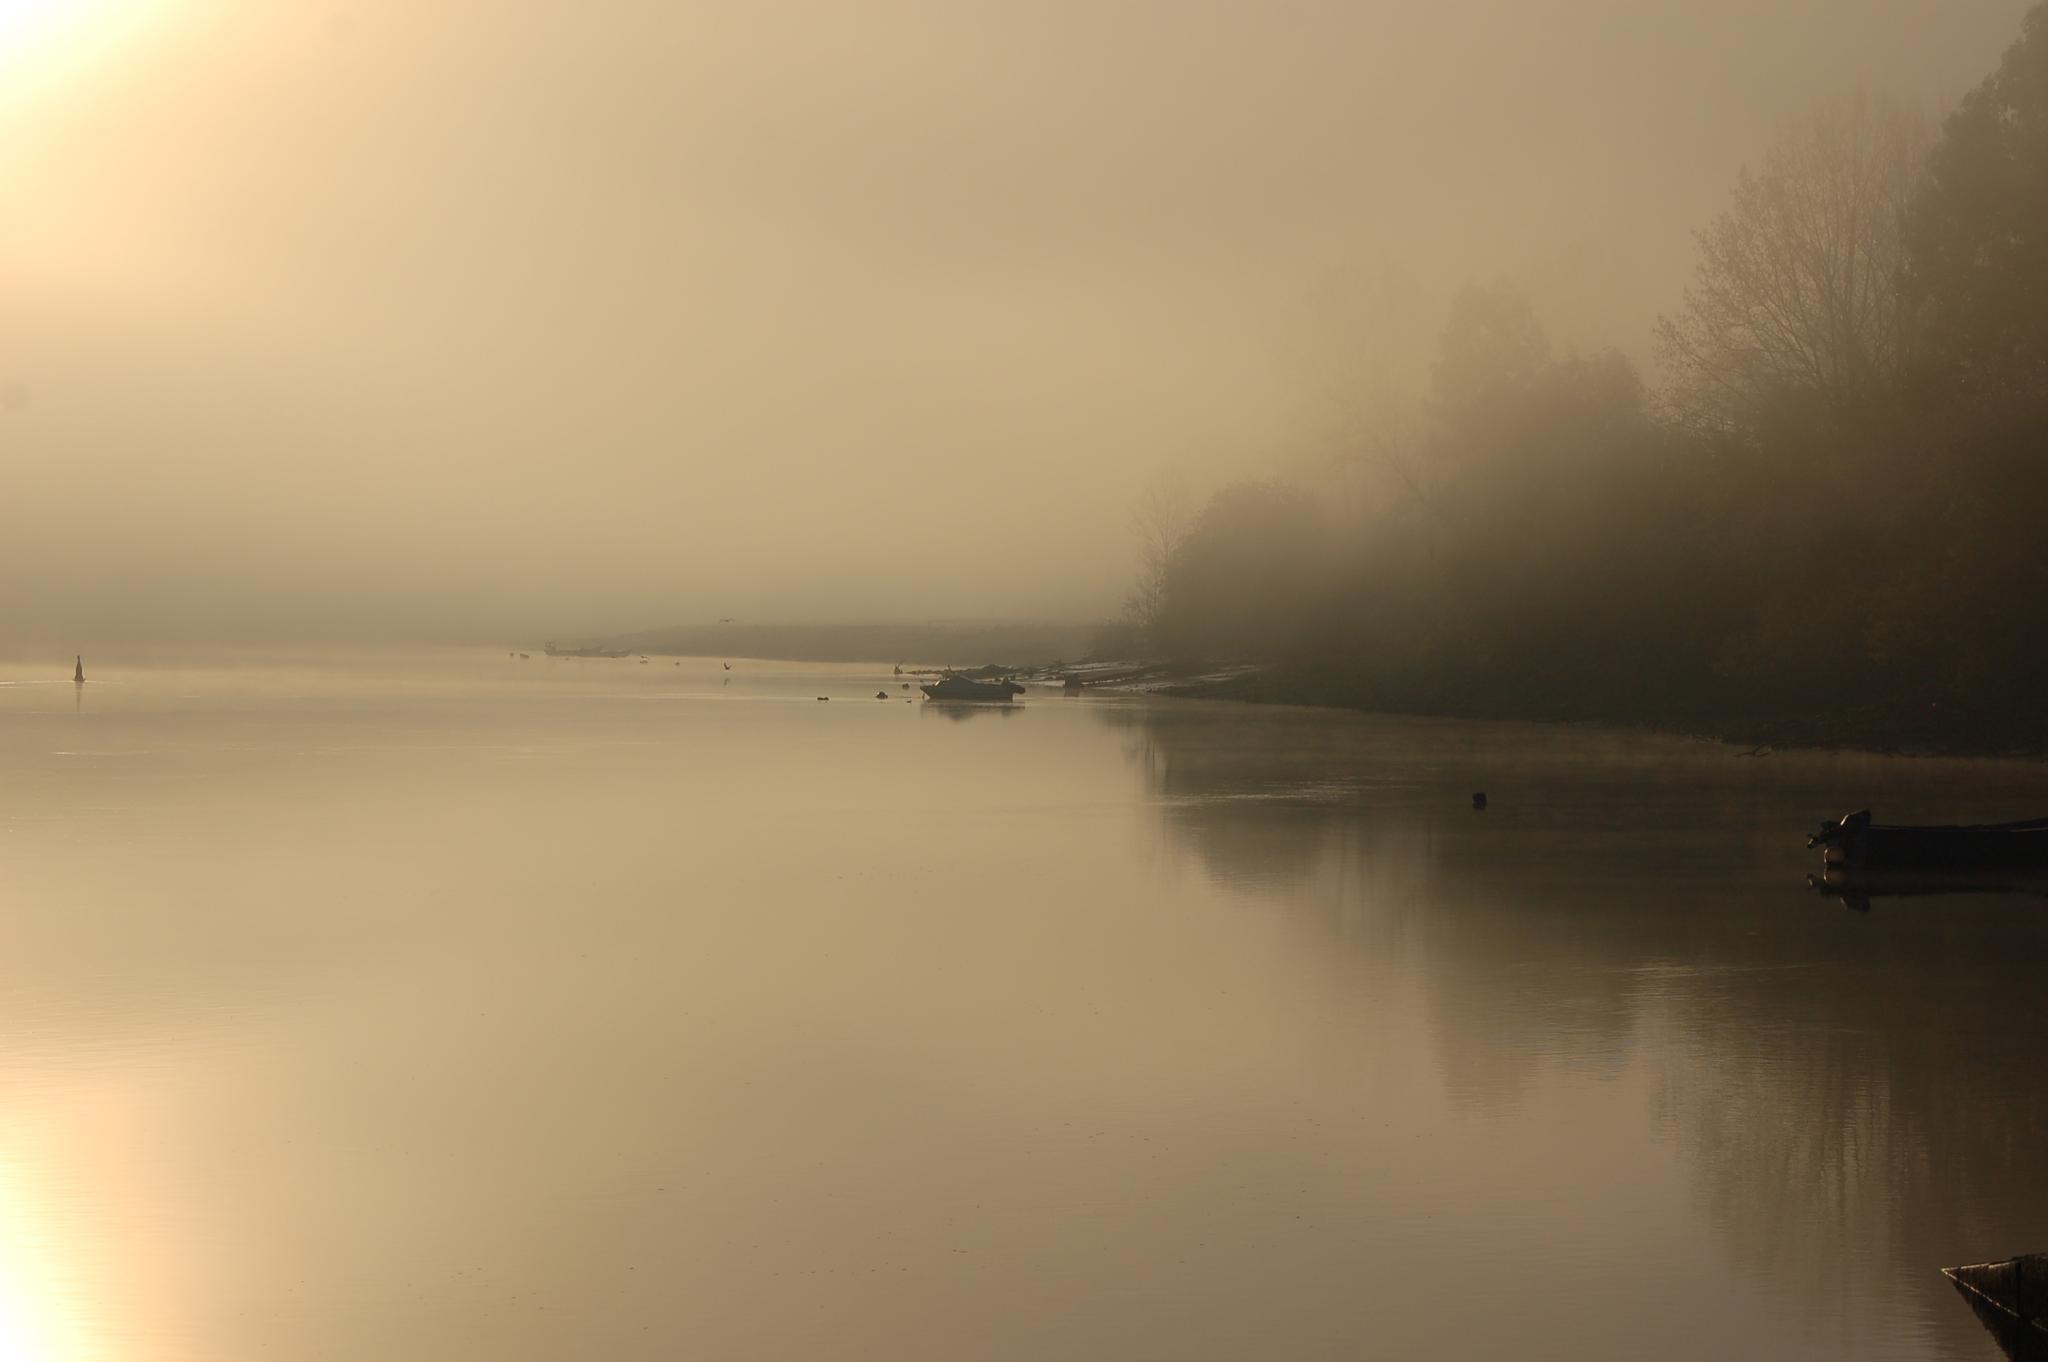 Early morning by João Almeida